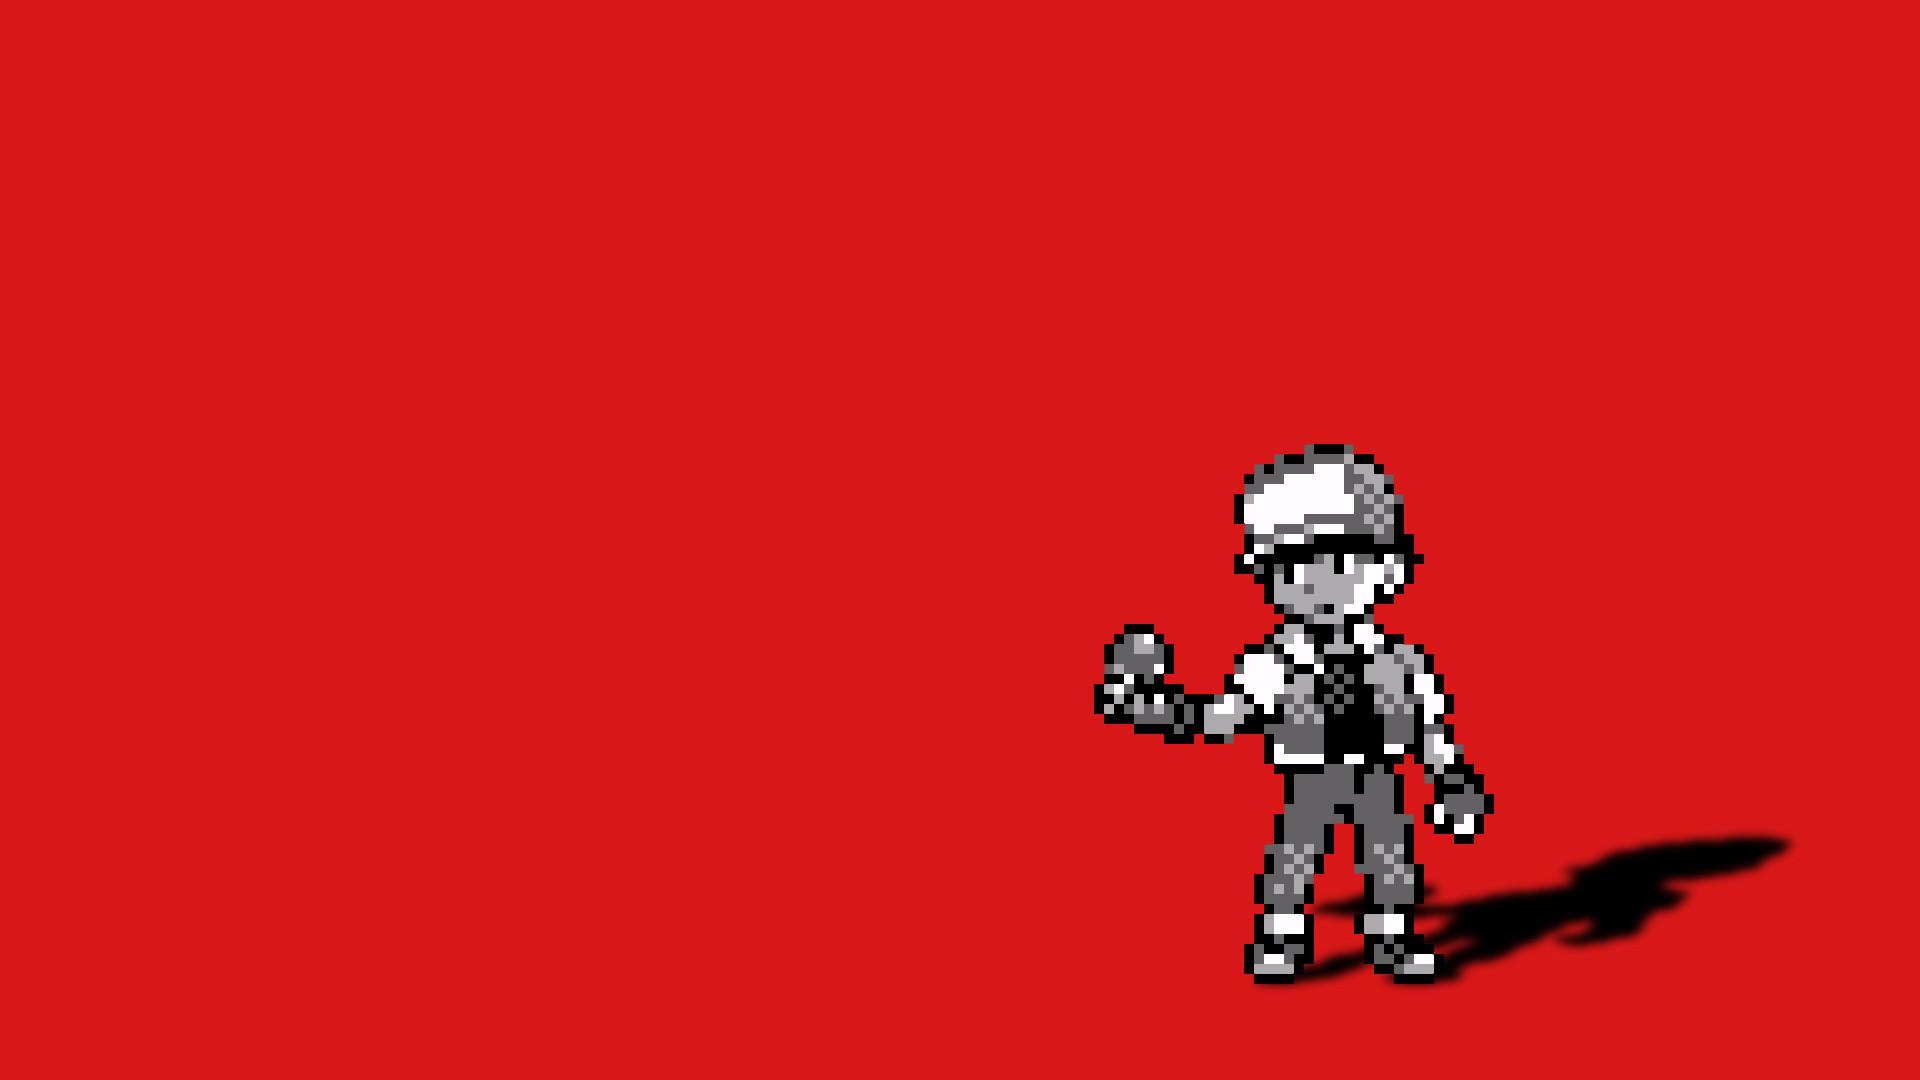 Pokemon Red 1920 X 1080 Wallpaper